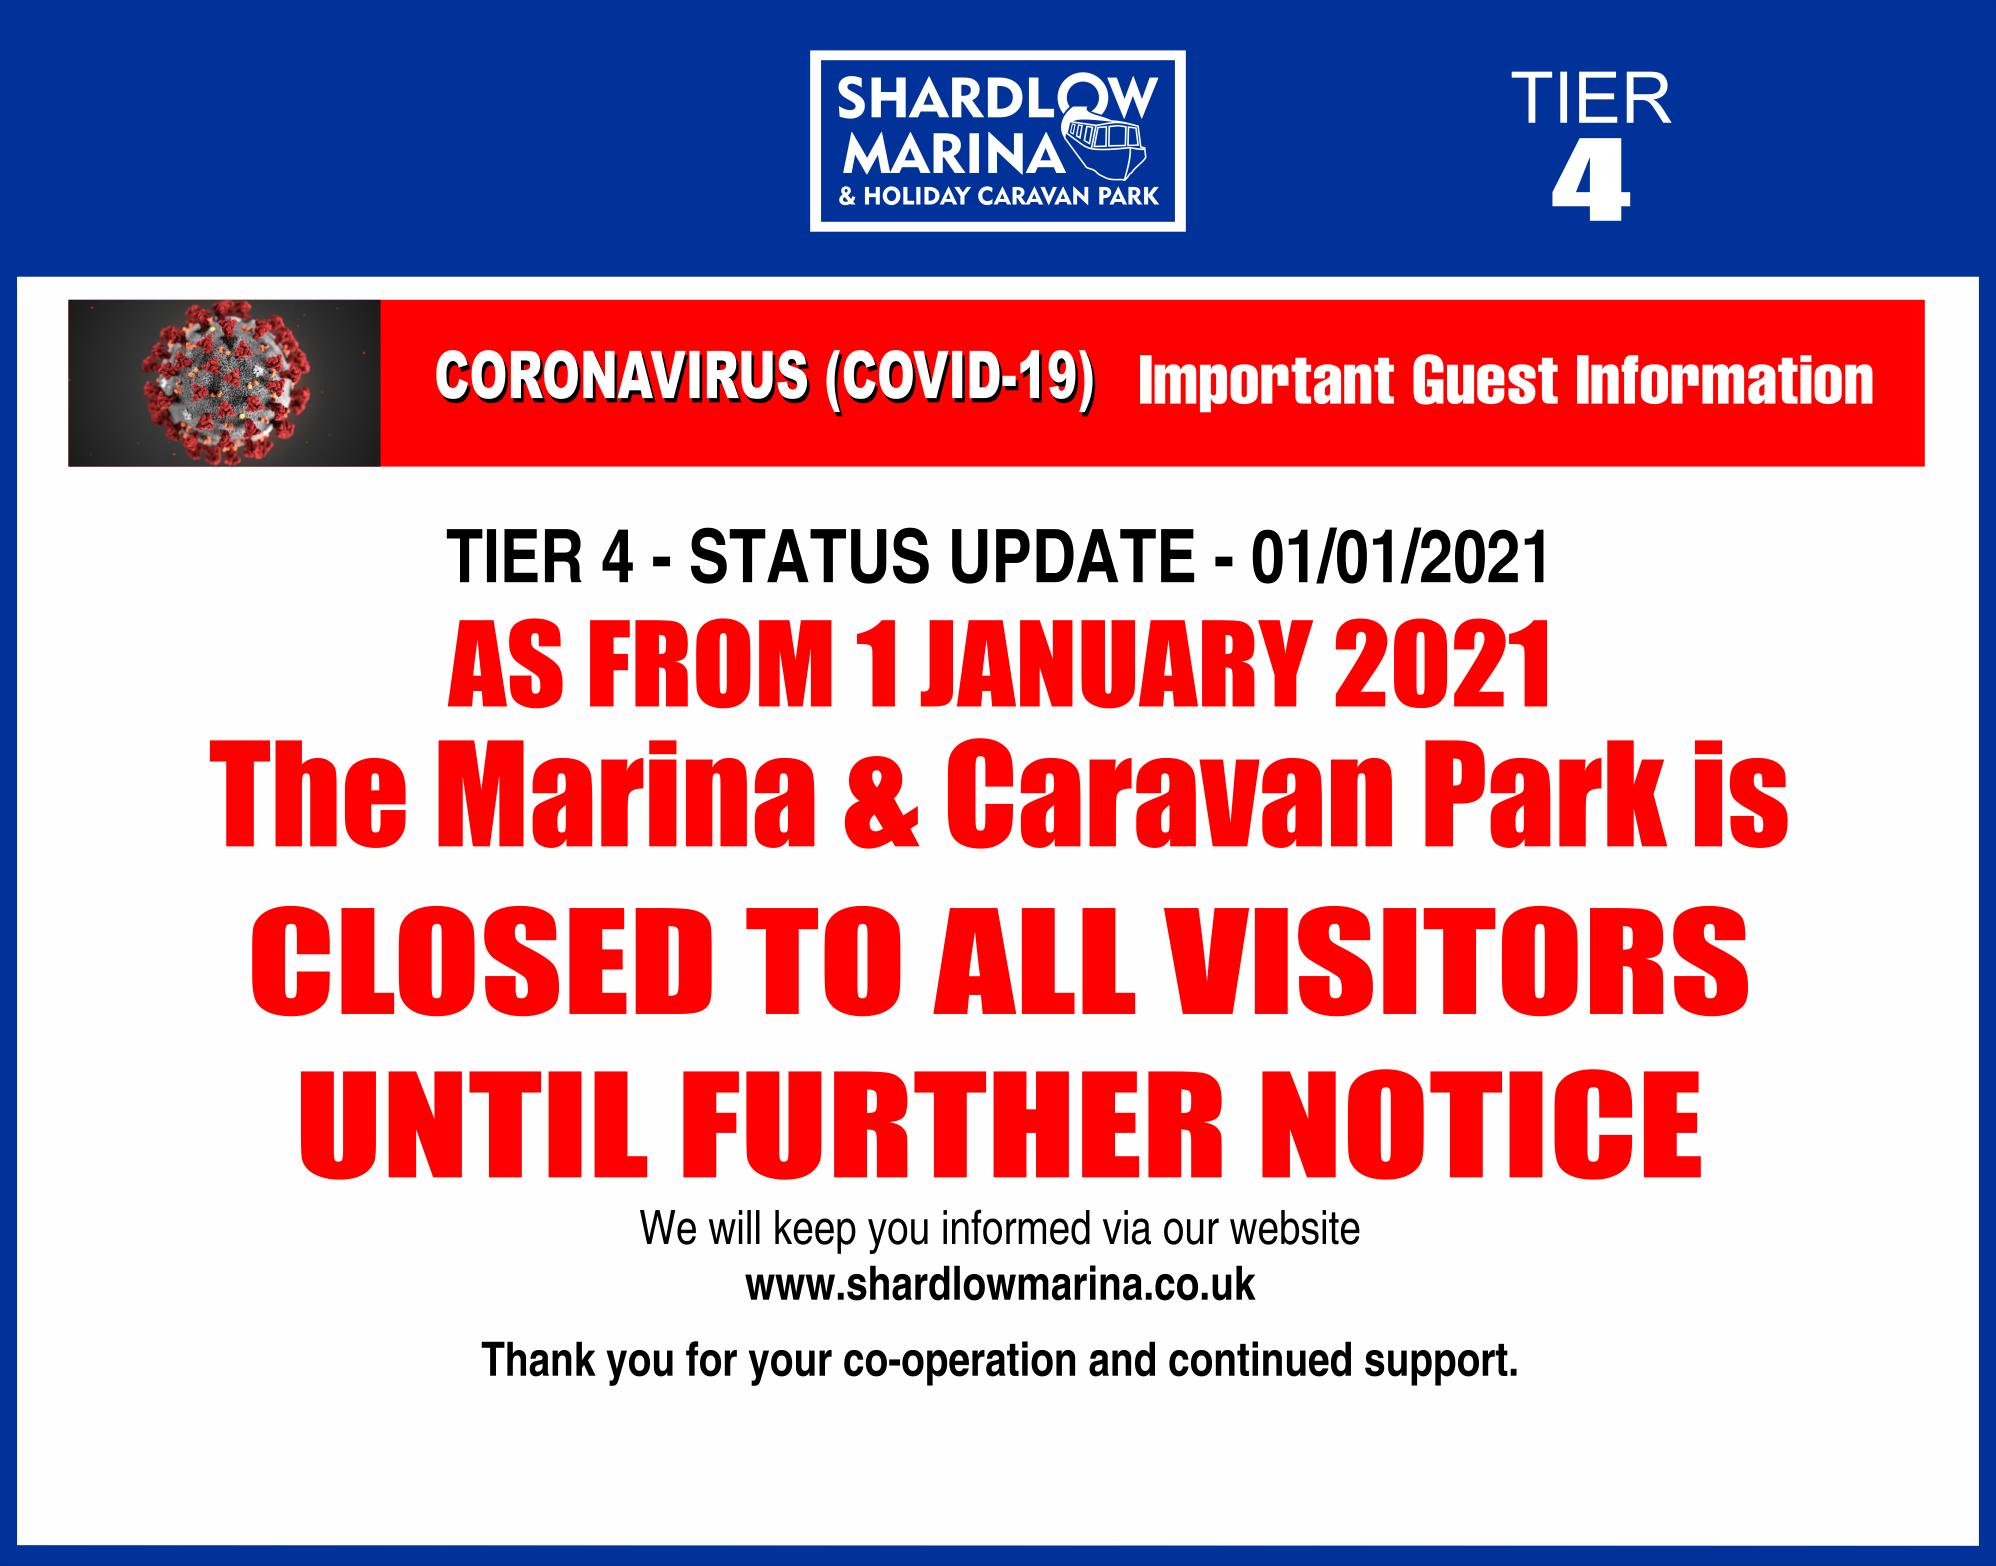 shardlow-Covid TIER 4 NOTICES 1jan2021